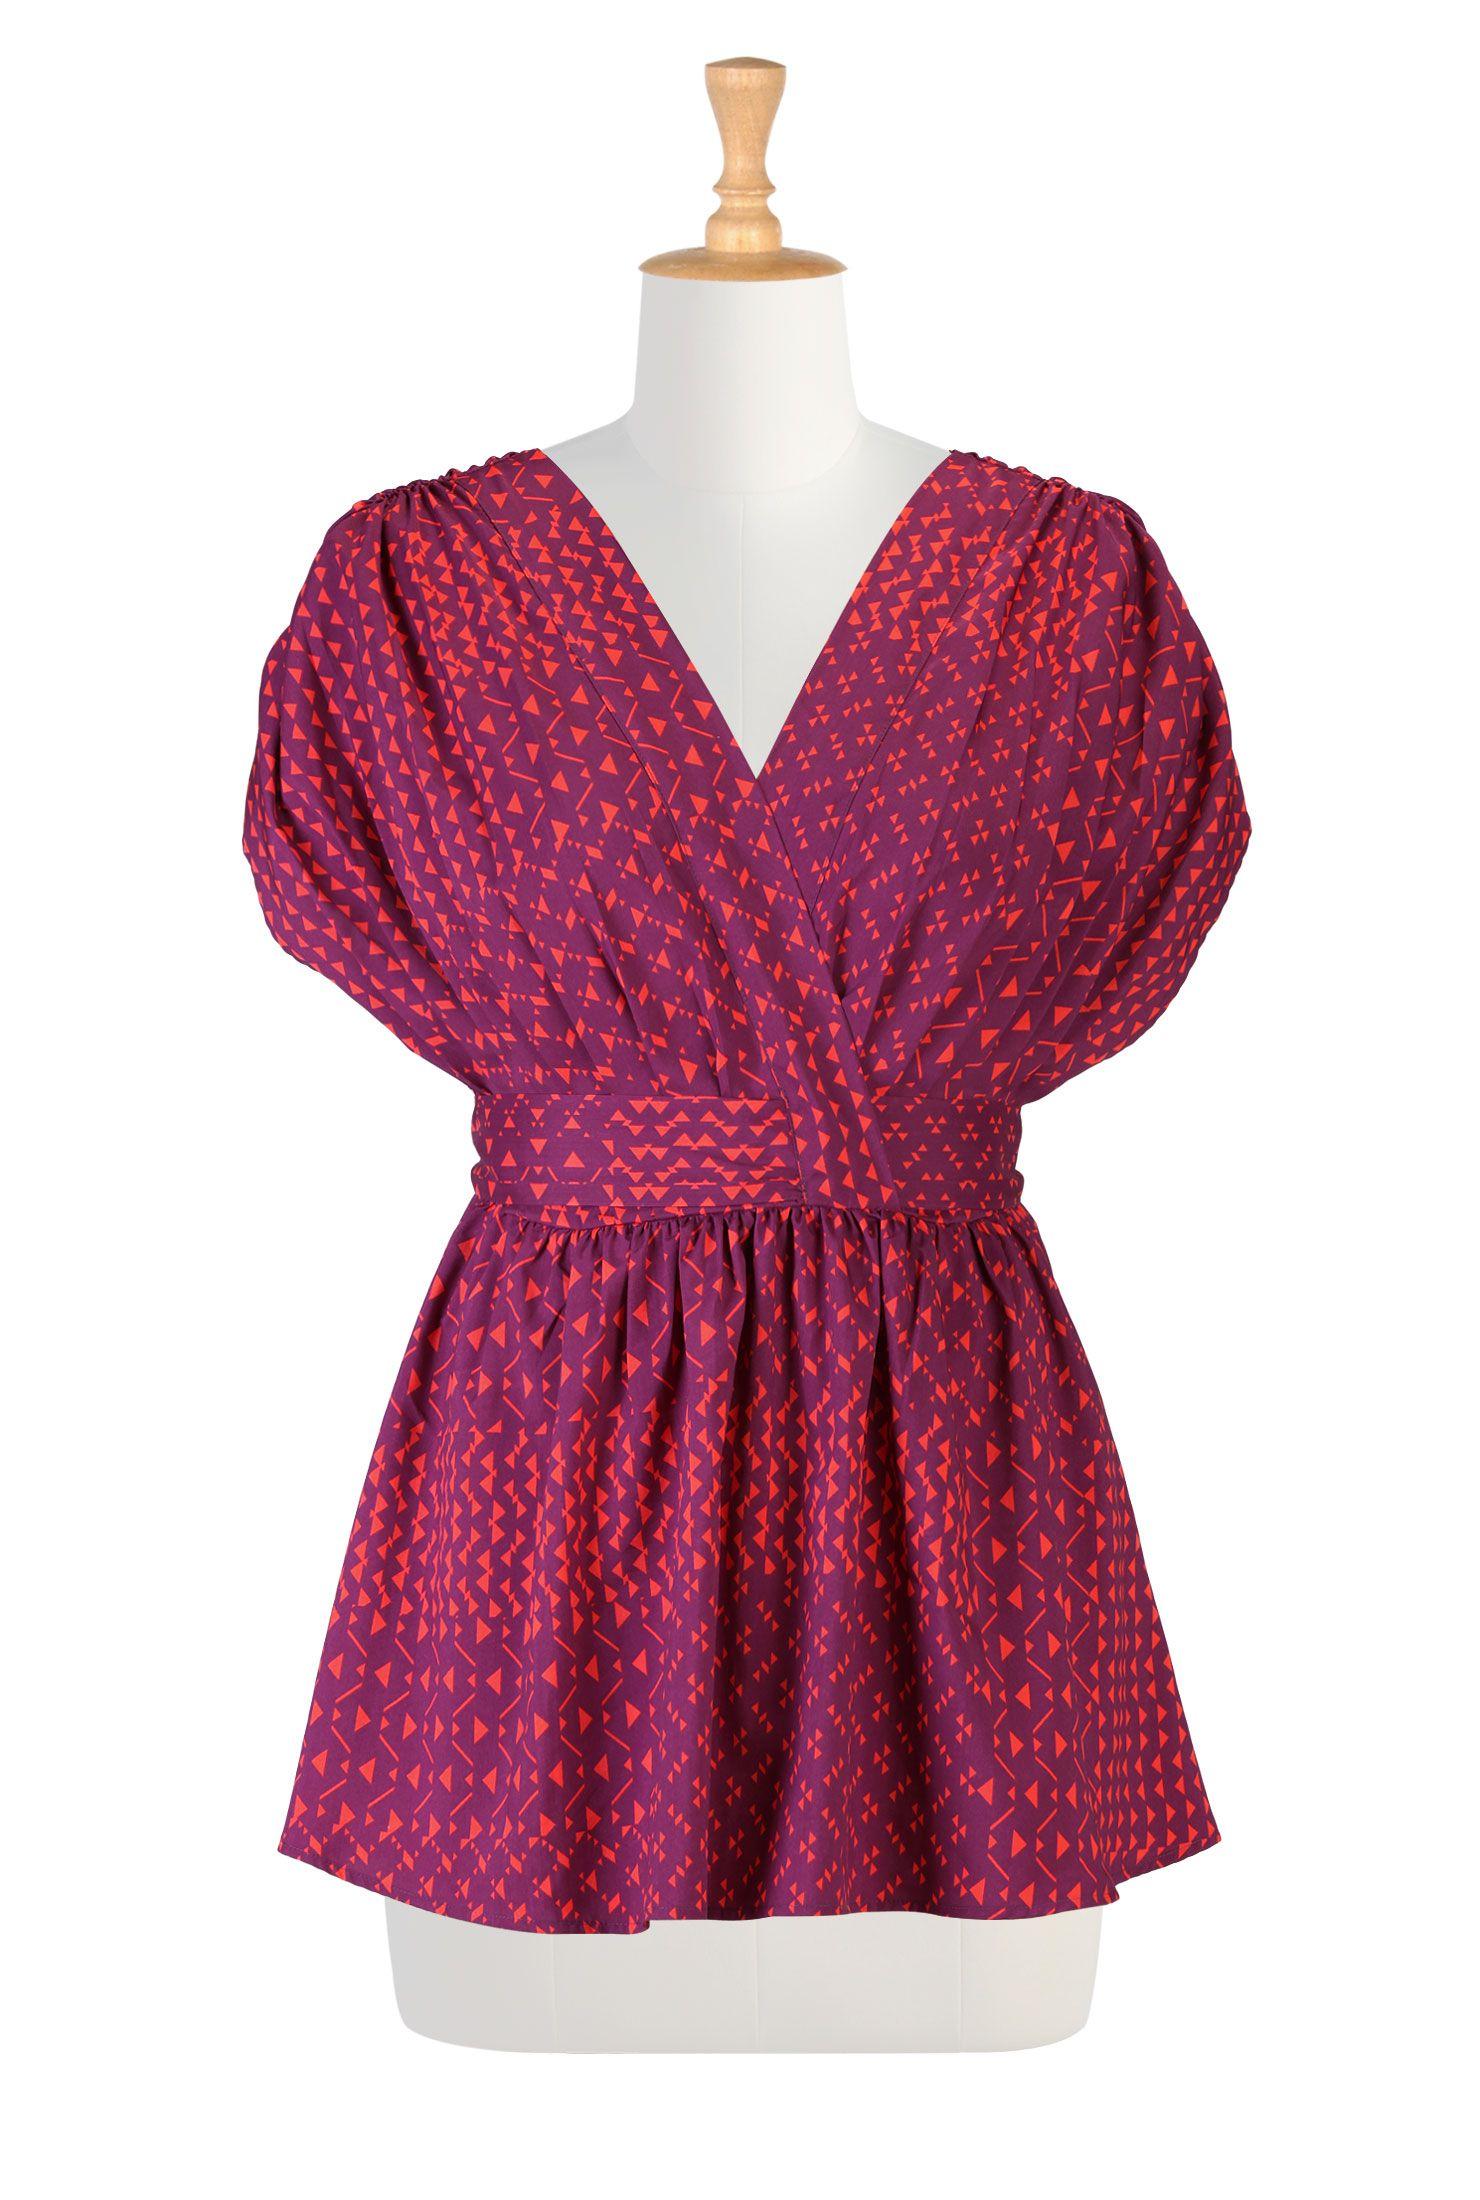 Faux wrap pleated print blouse fashion design